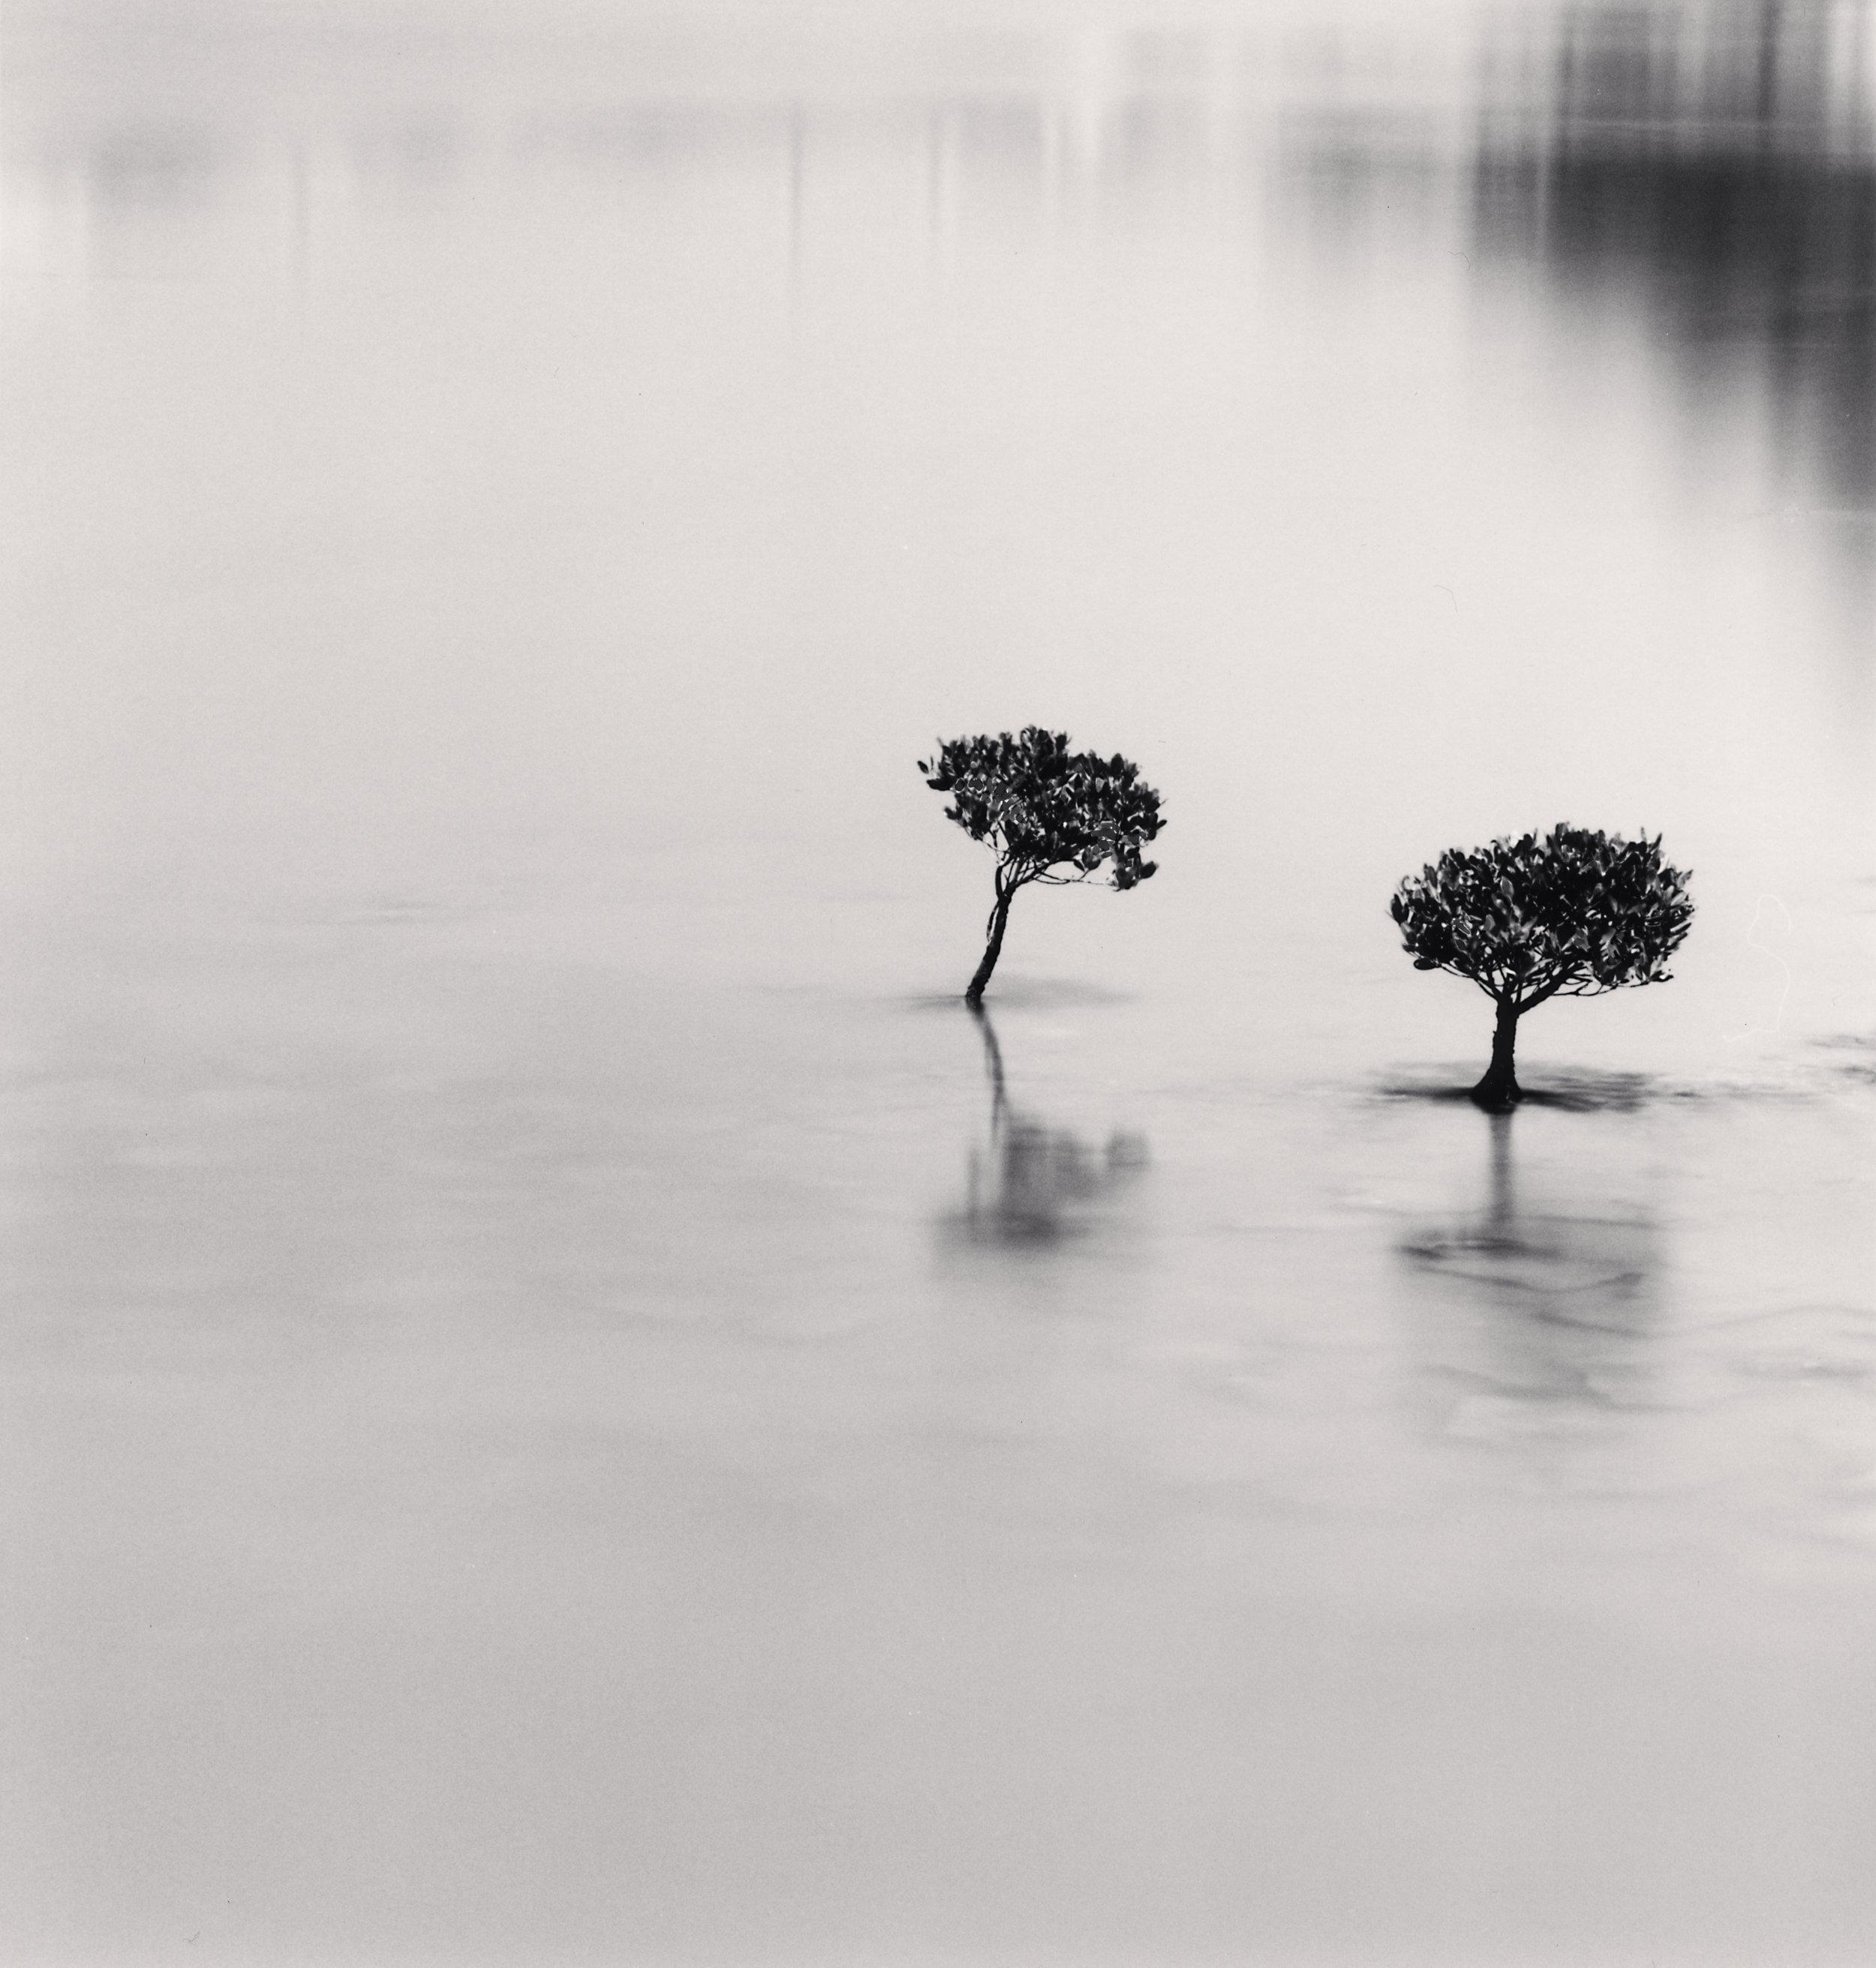 ©Michael KennaTwo Mangrove Plants, Lantau Island, Hong Kong2007